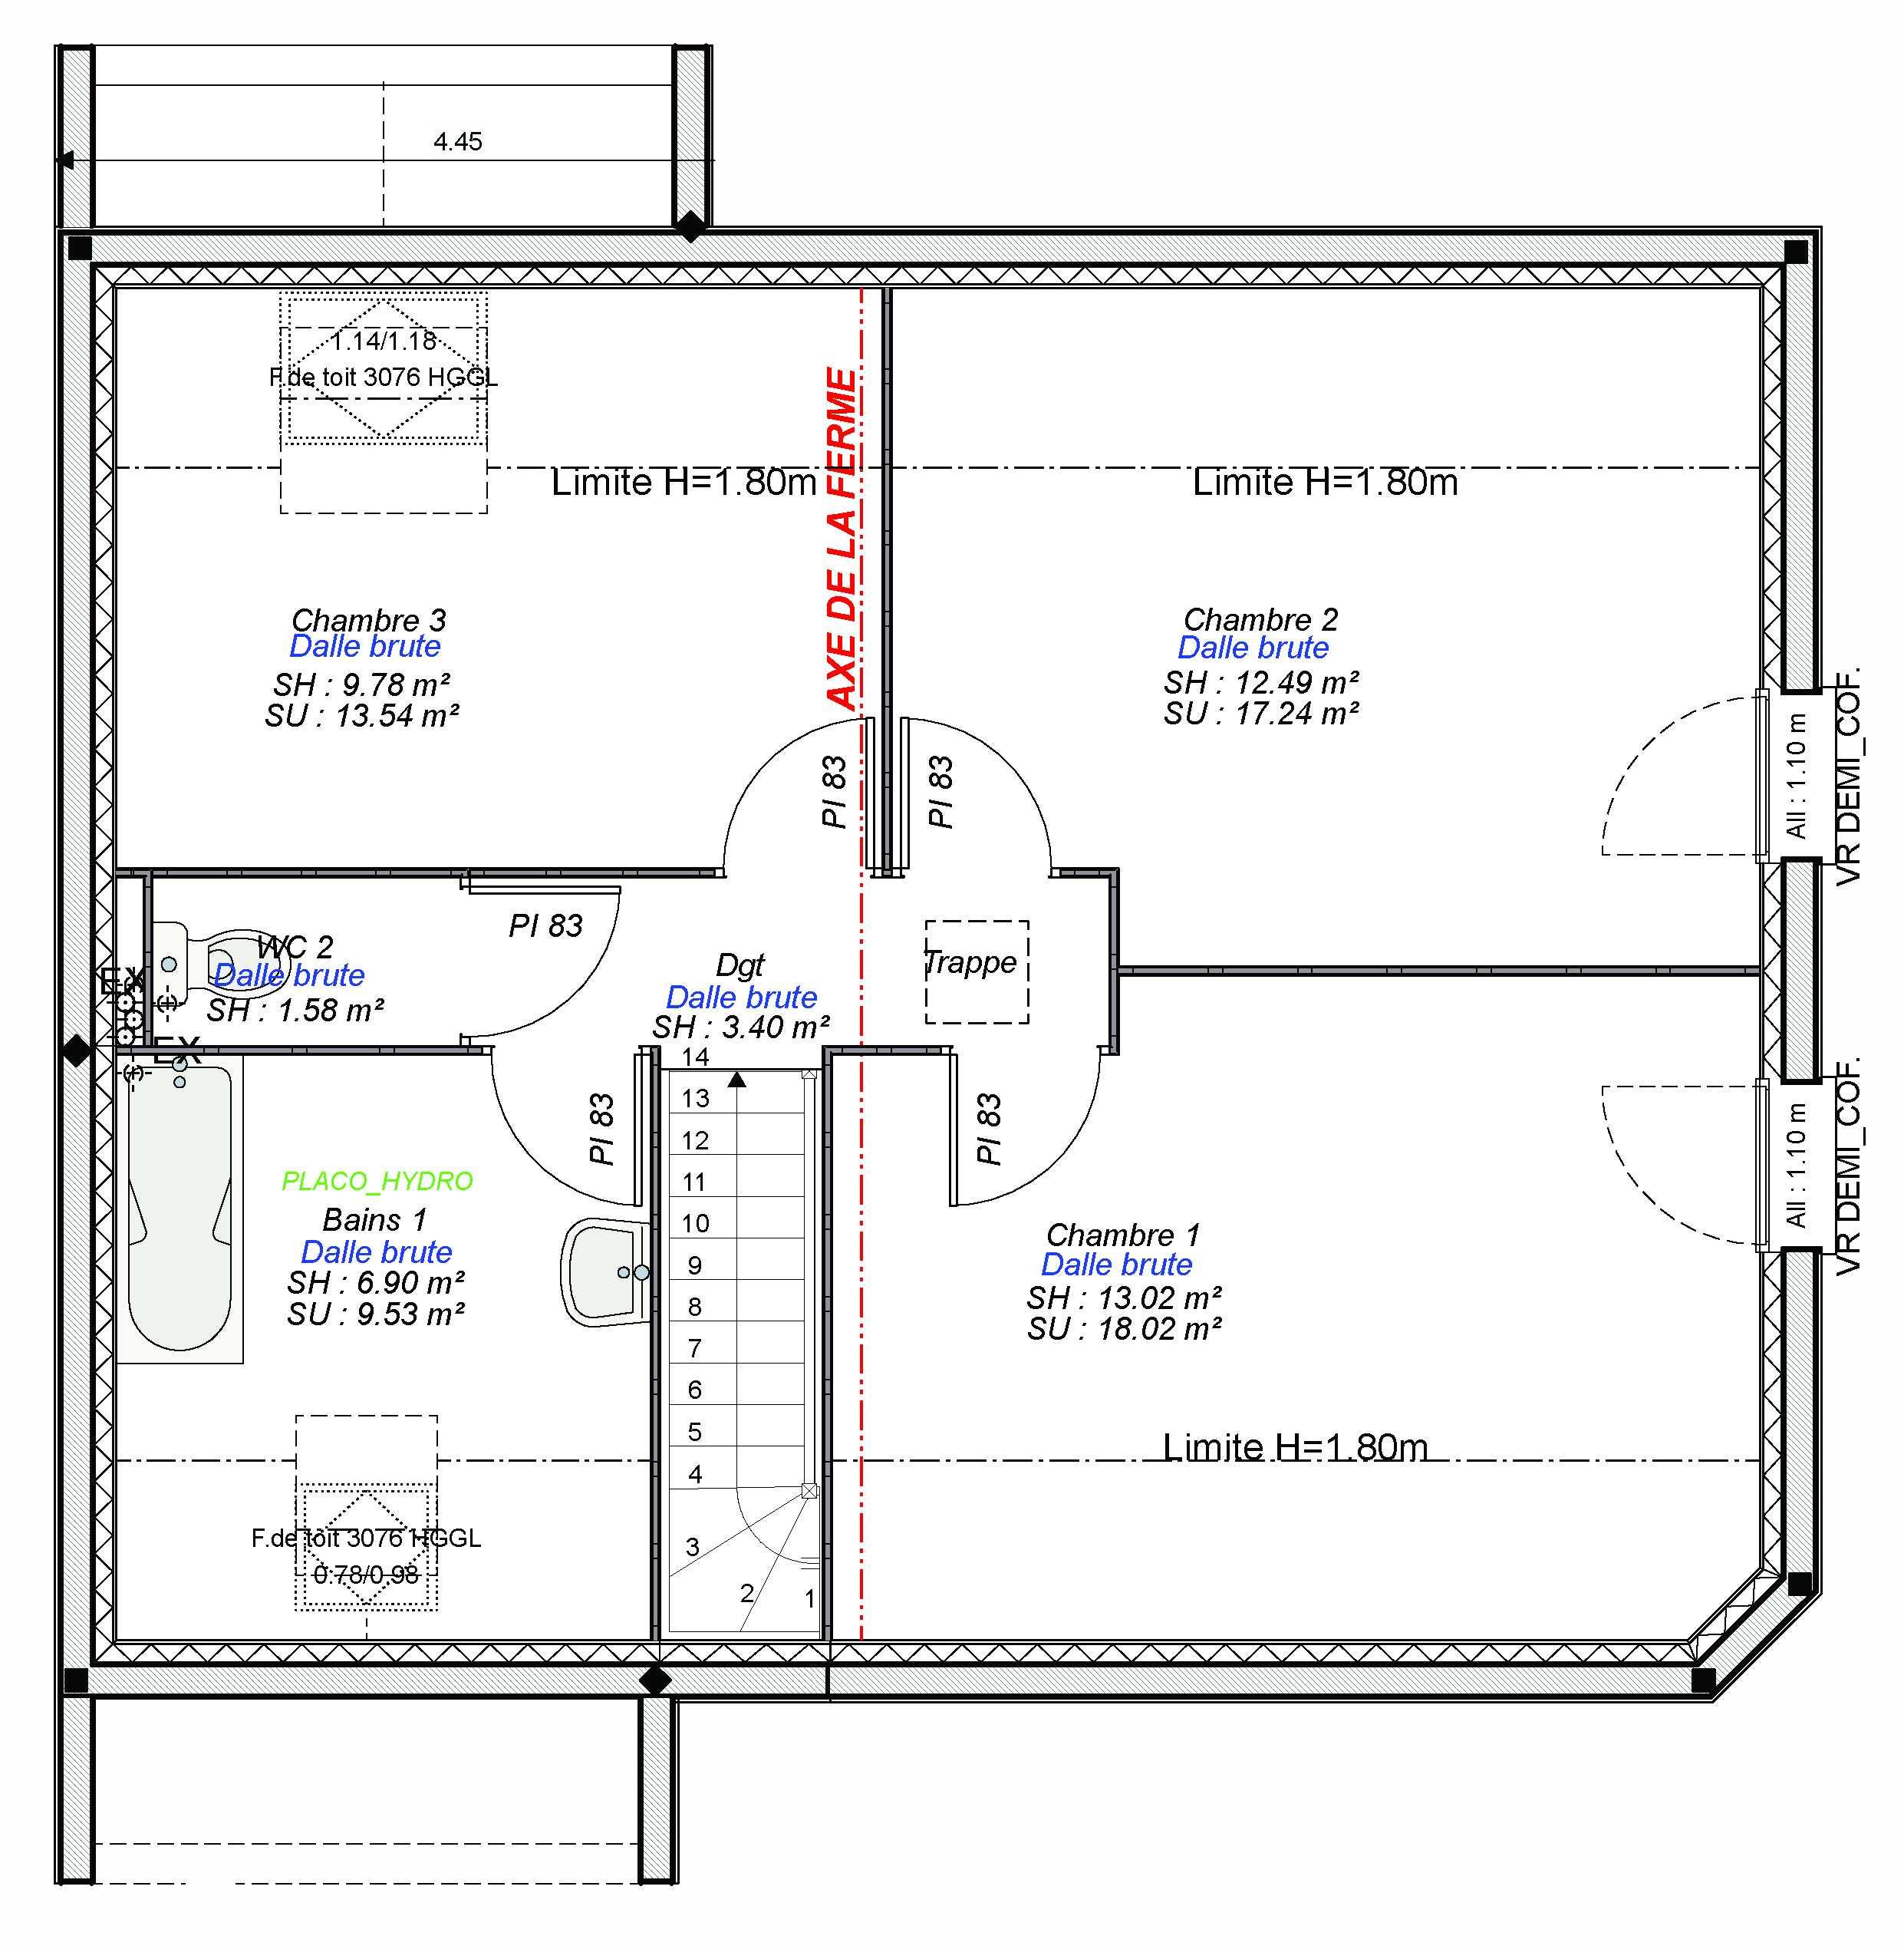 Constructeur maisons individuelles Caen-WELCOME-AXCESS 4CH+GI 103 M² (1)- étage